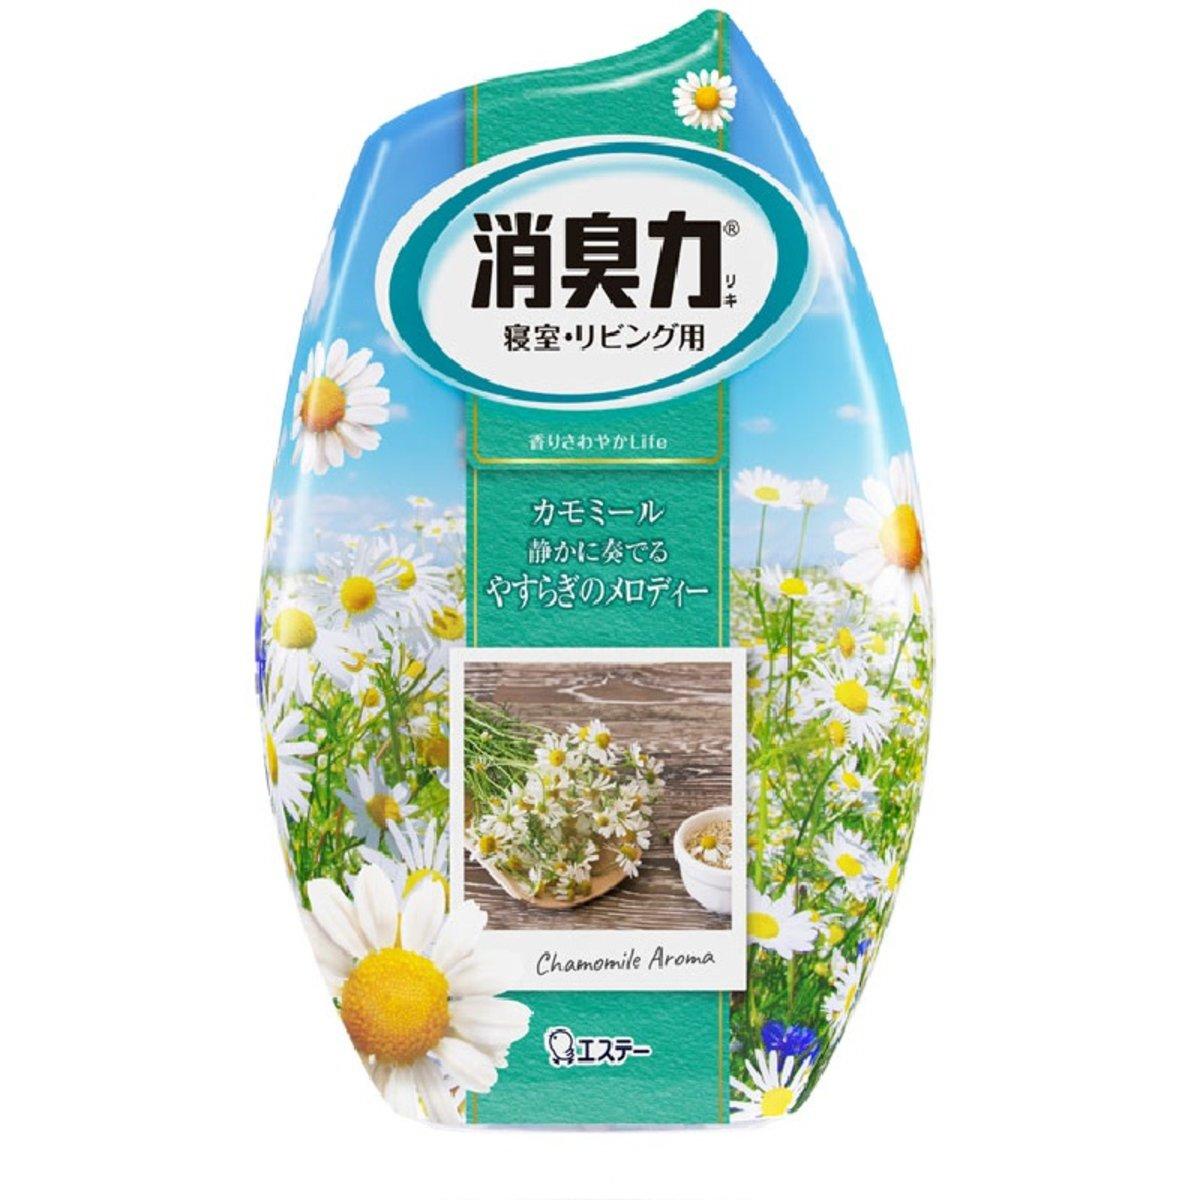 S.T. Corporation Indoor Deodorant (Green) #Chamomile Aroma 400ml